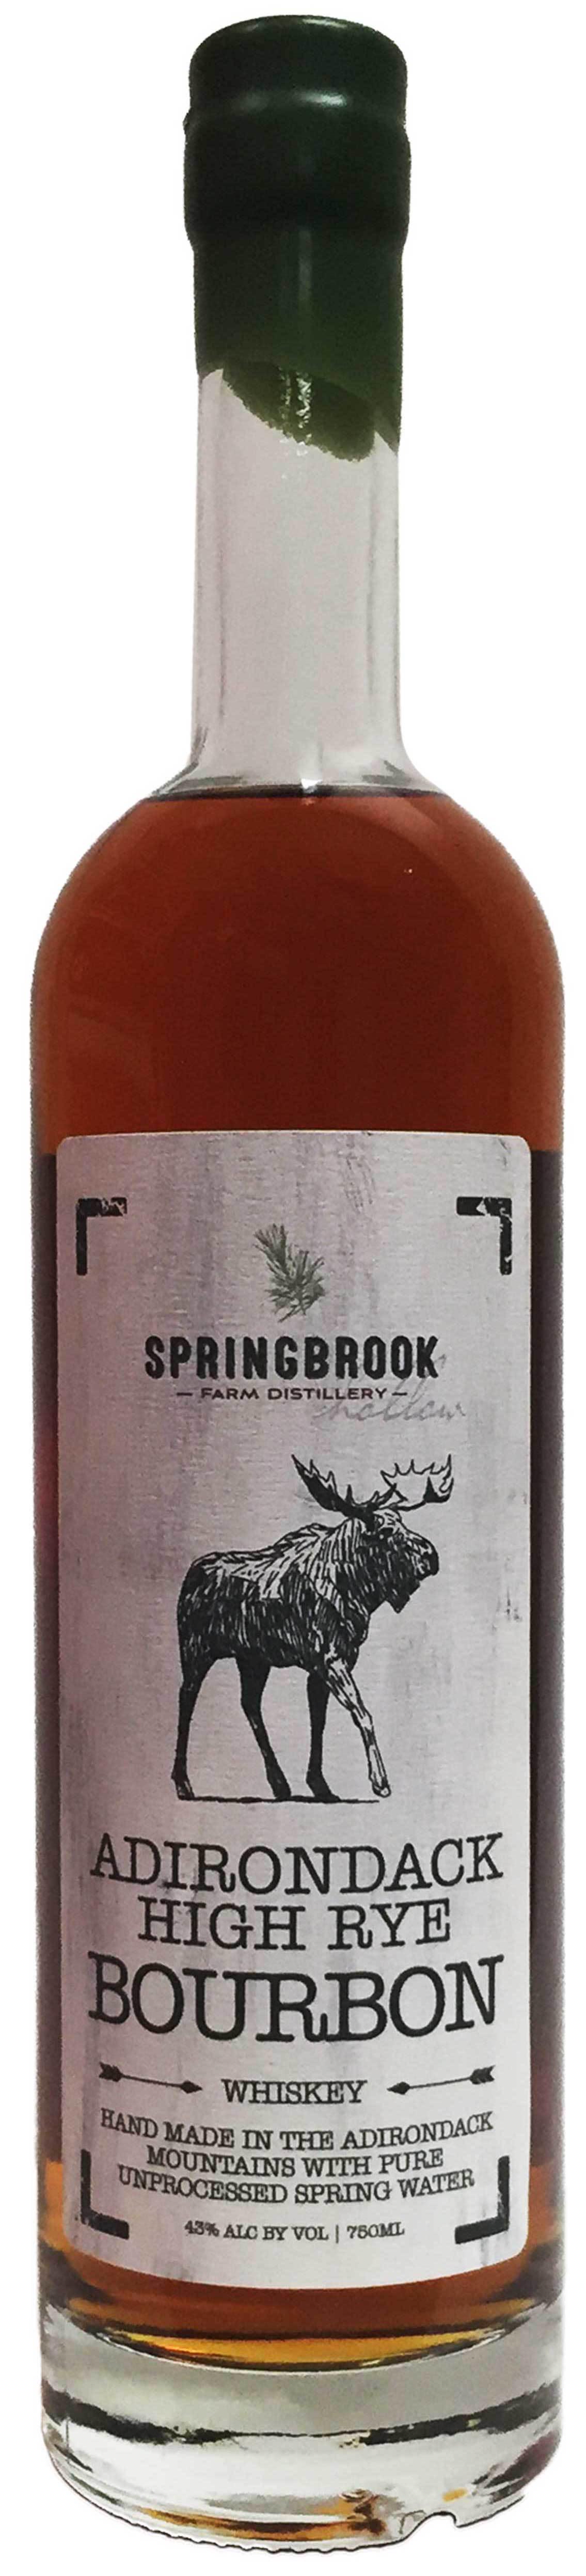 Springbrook Hollow Farm Distillery Adirondack High Rye Bourbon